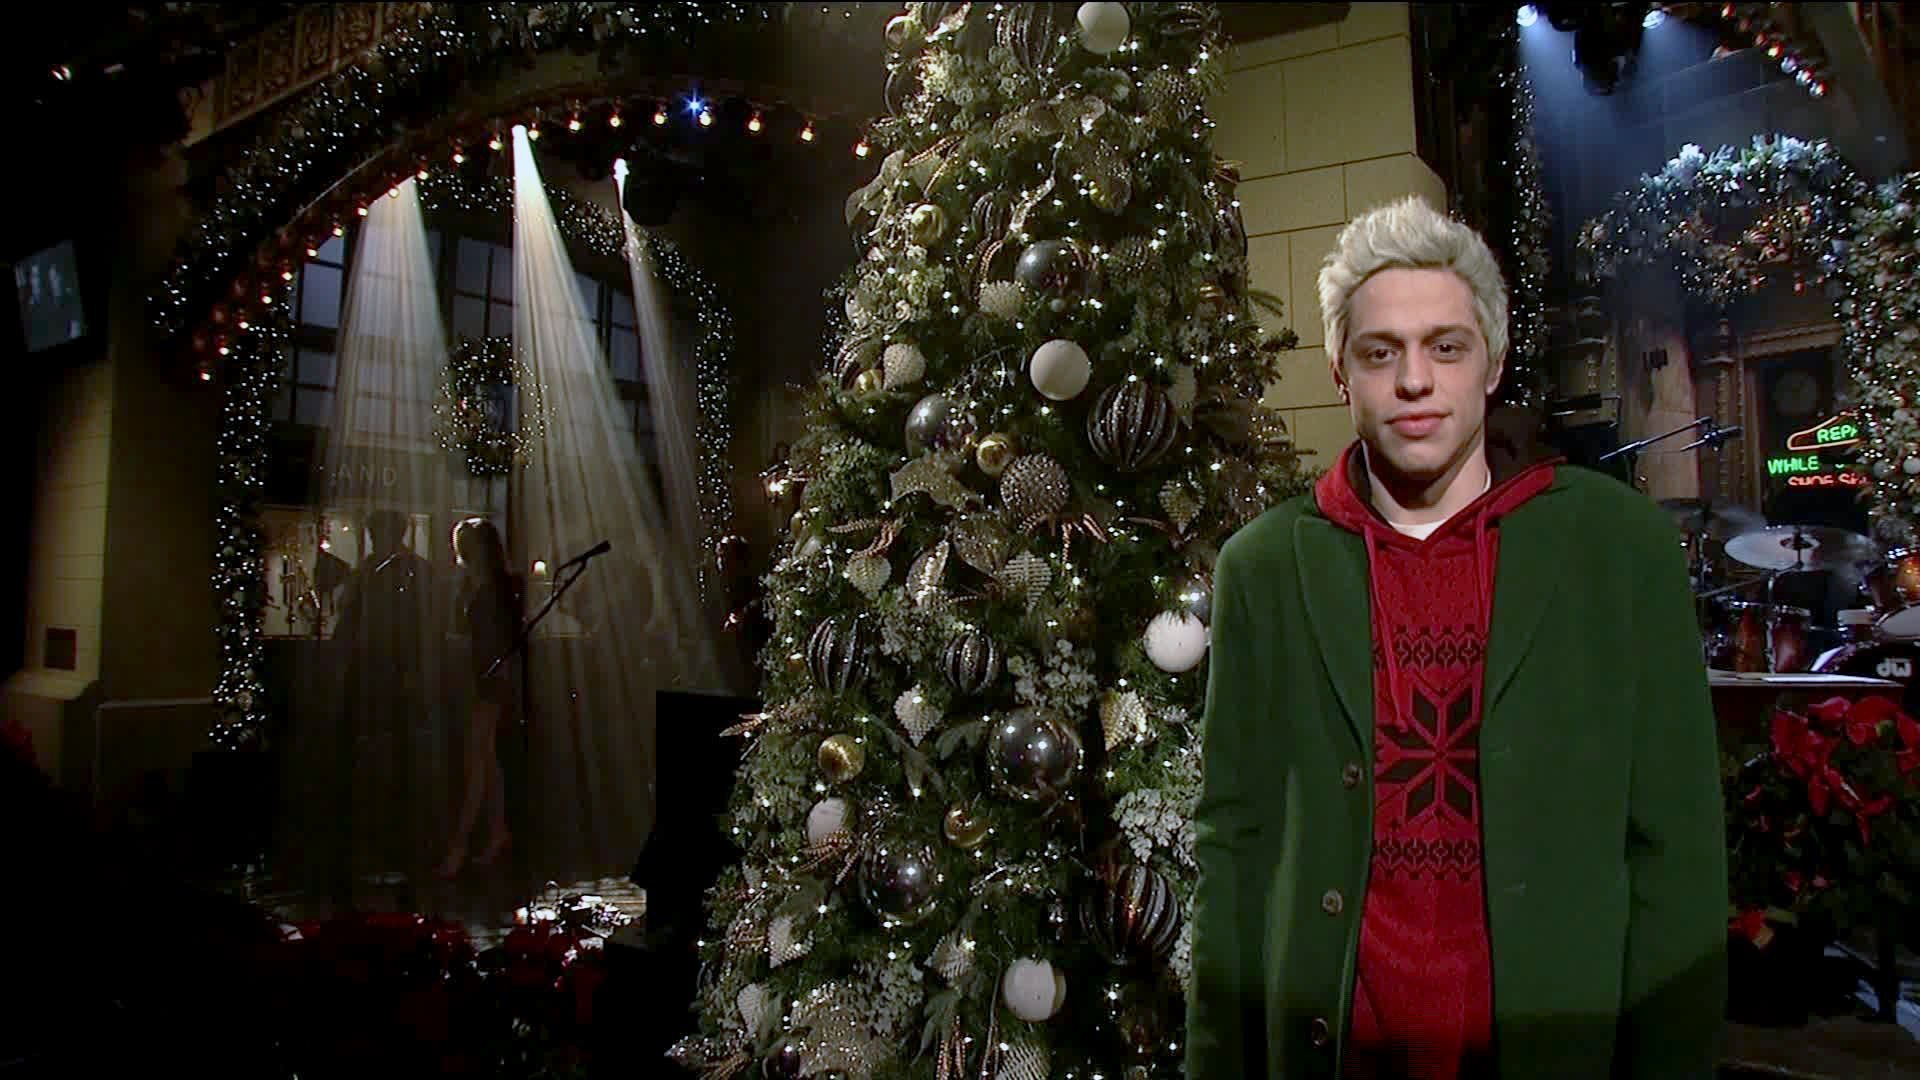 Davidson on the December 15 episode of Saturday Night Live. (Credit: NBC/Broadway Video via CNN Wire)